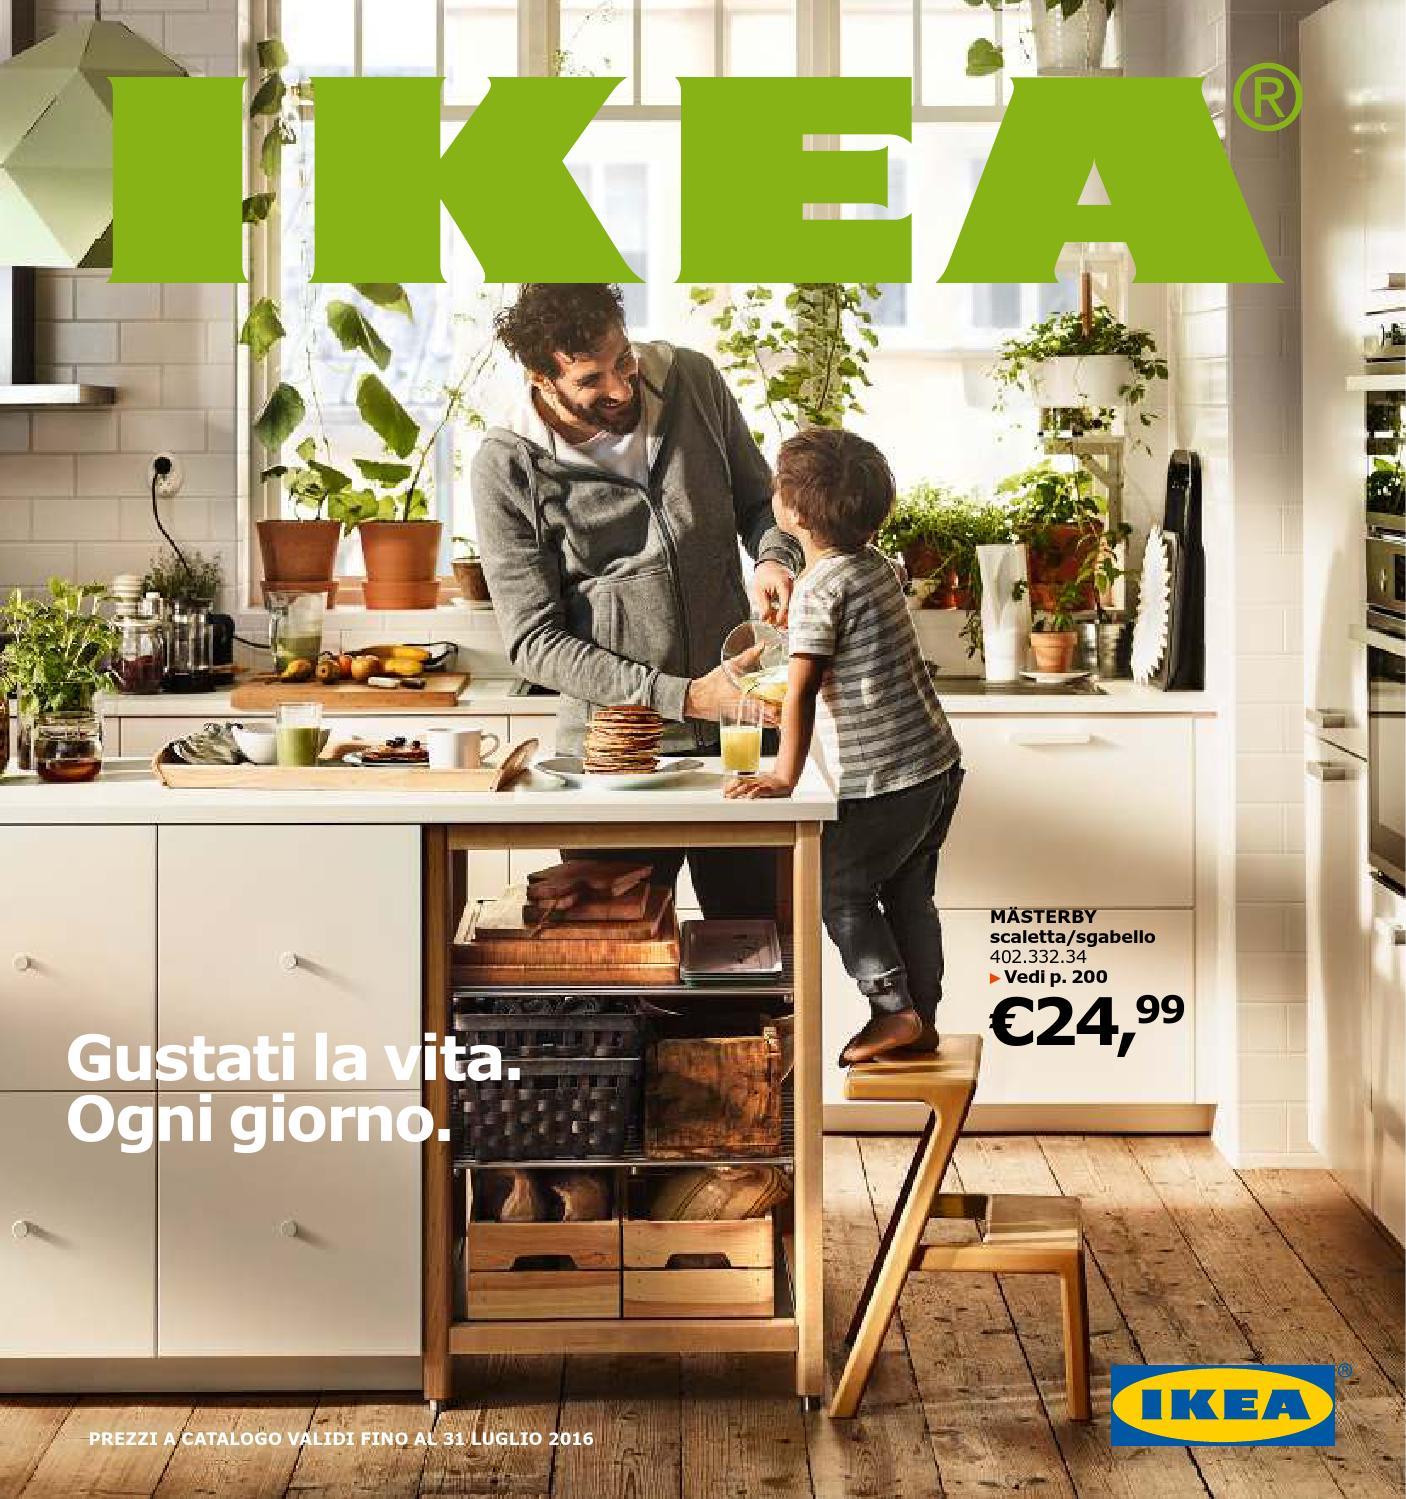 Binario Pensili Cucina Ikea ikea catalogo 2016 by mobilpro - issuu